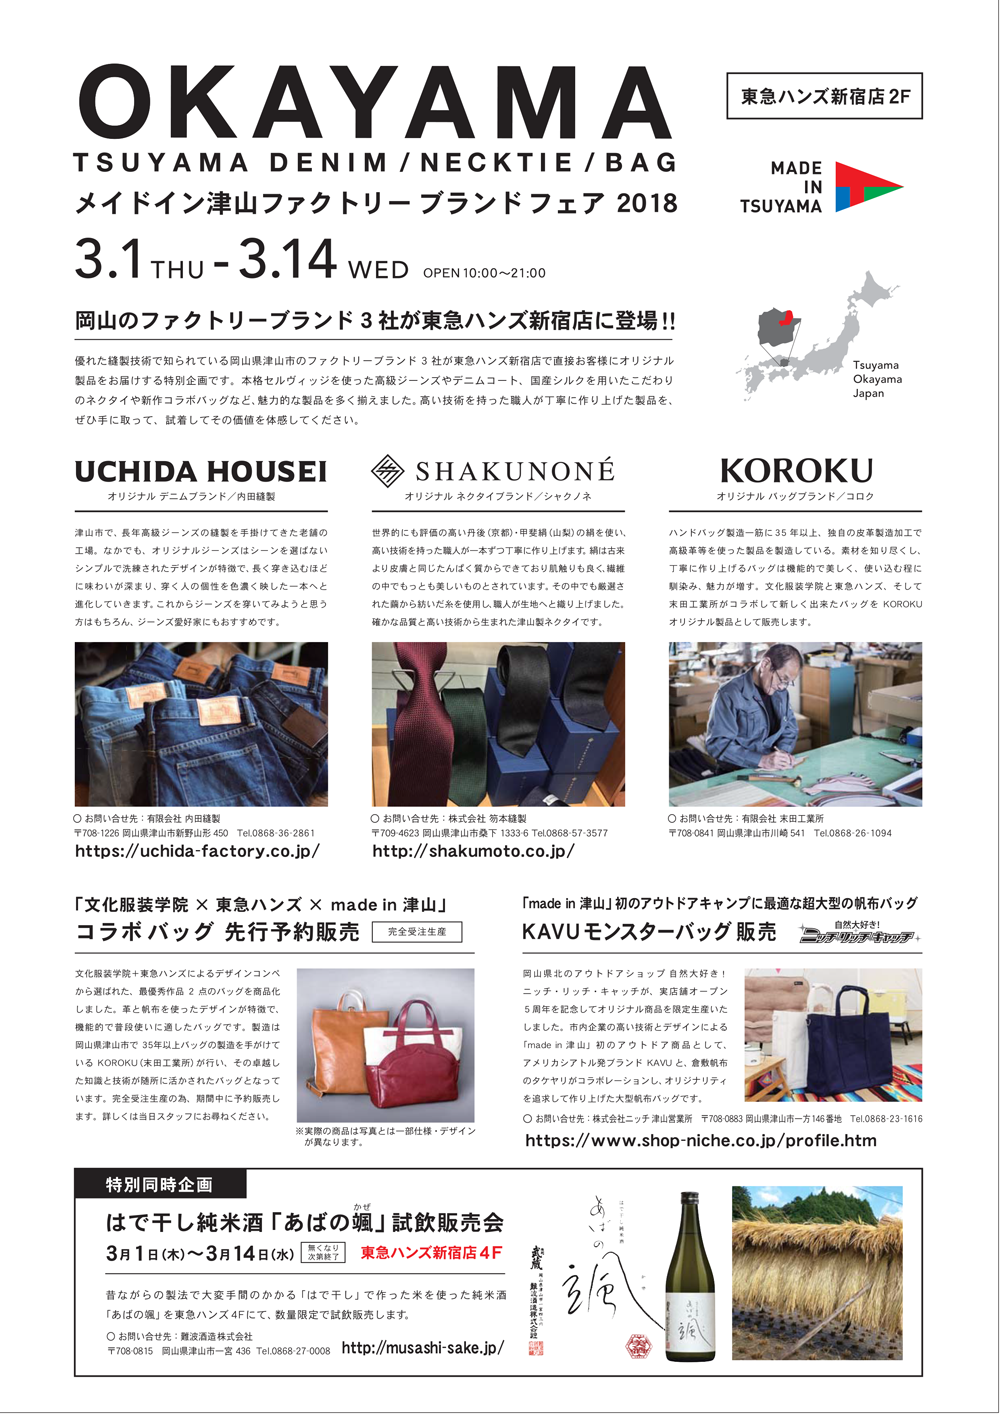 【POP UP】東京新宿「東急ハンズ新宿店」に出店します